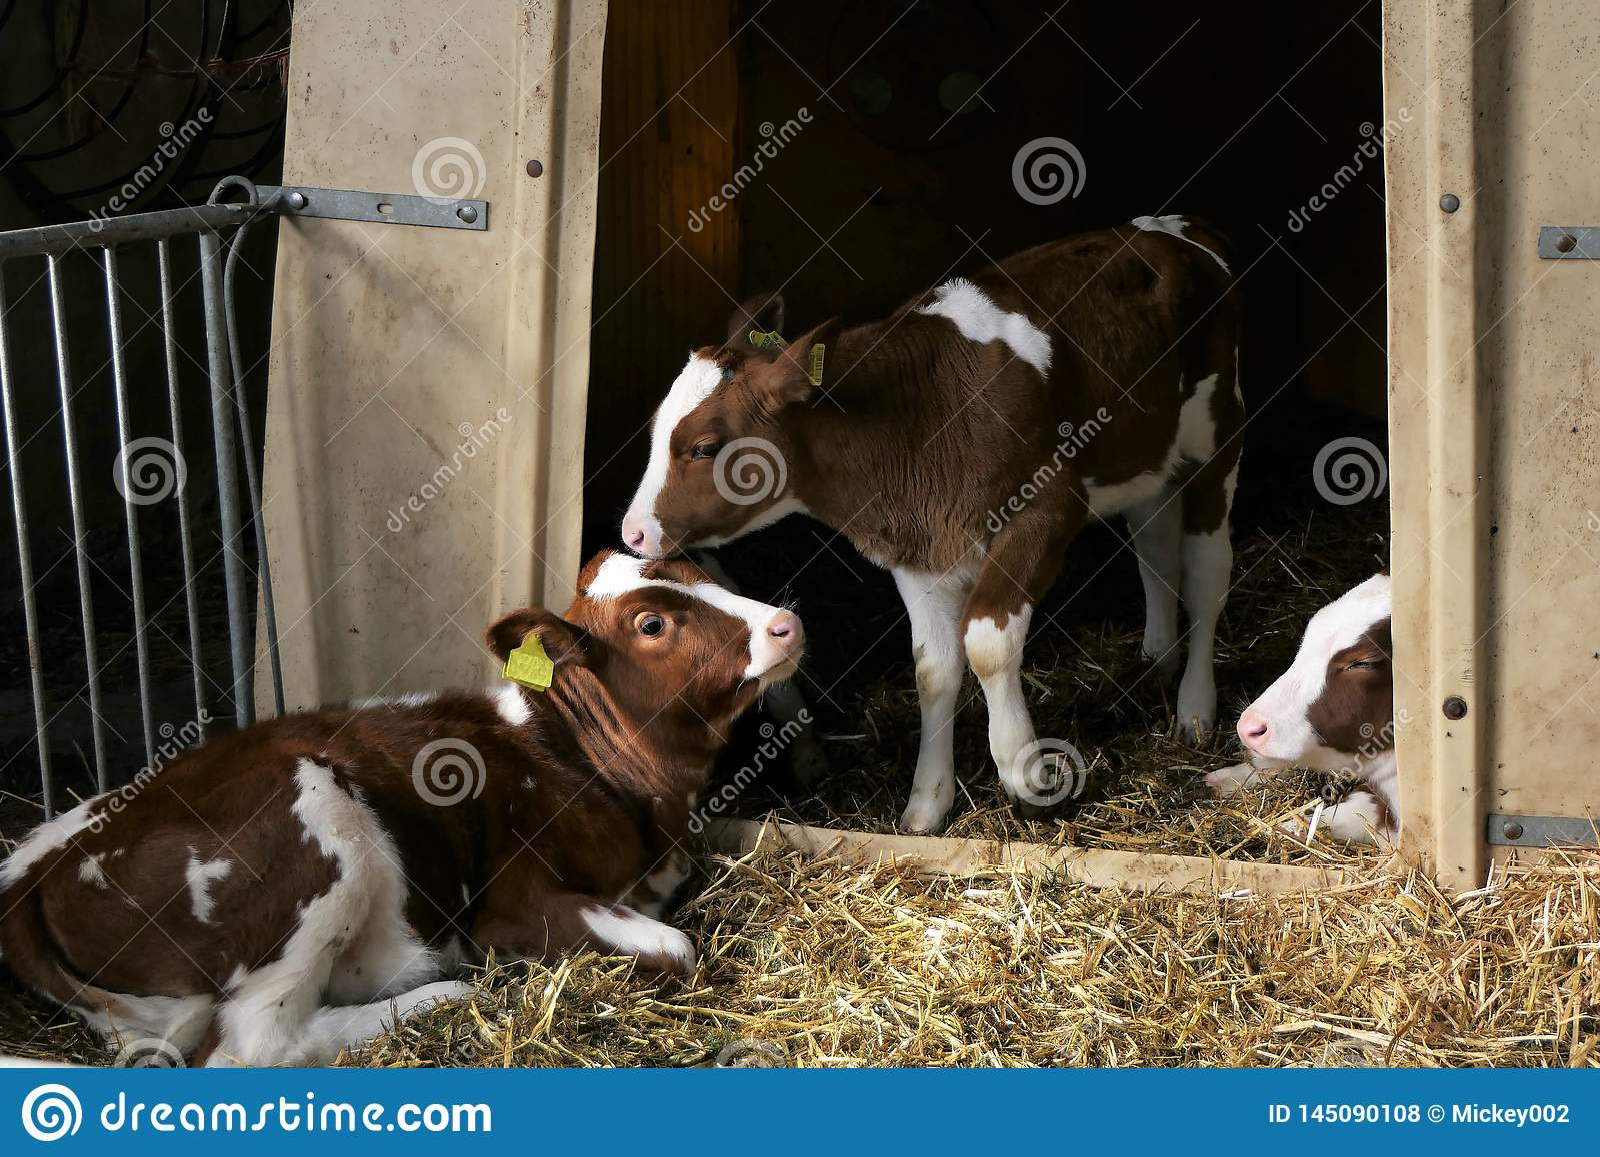 Three calfs stable